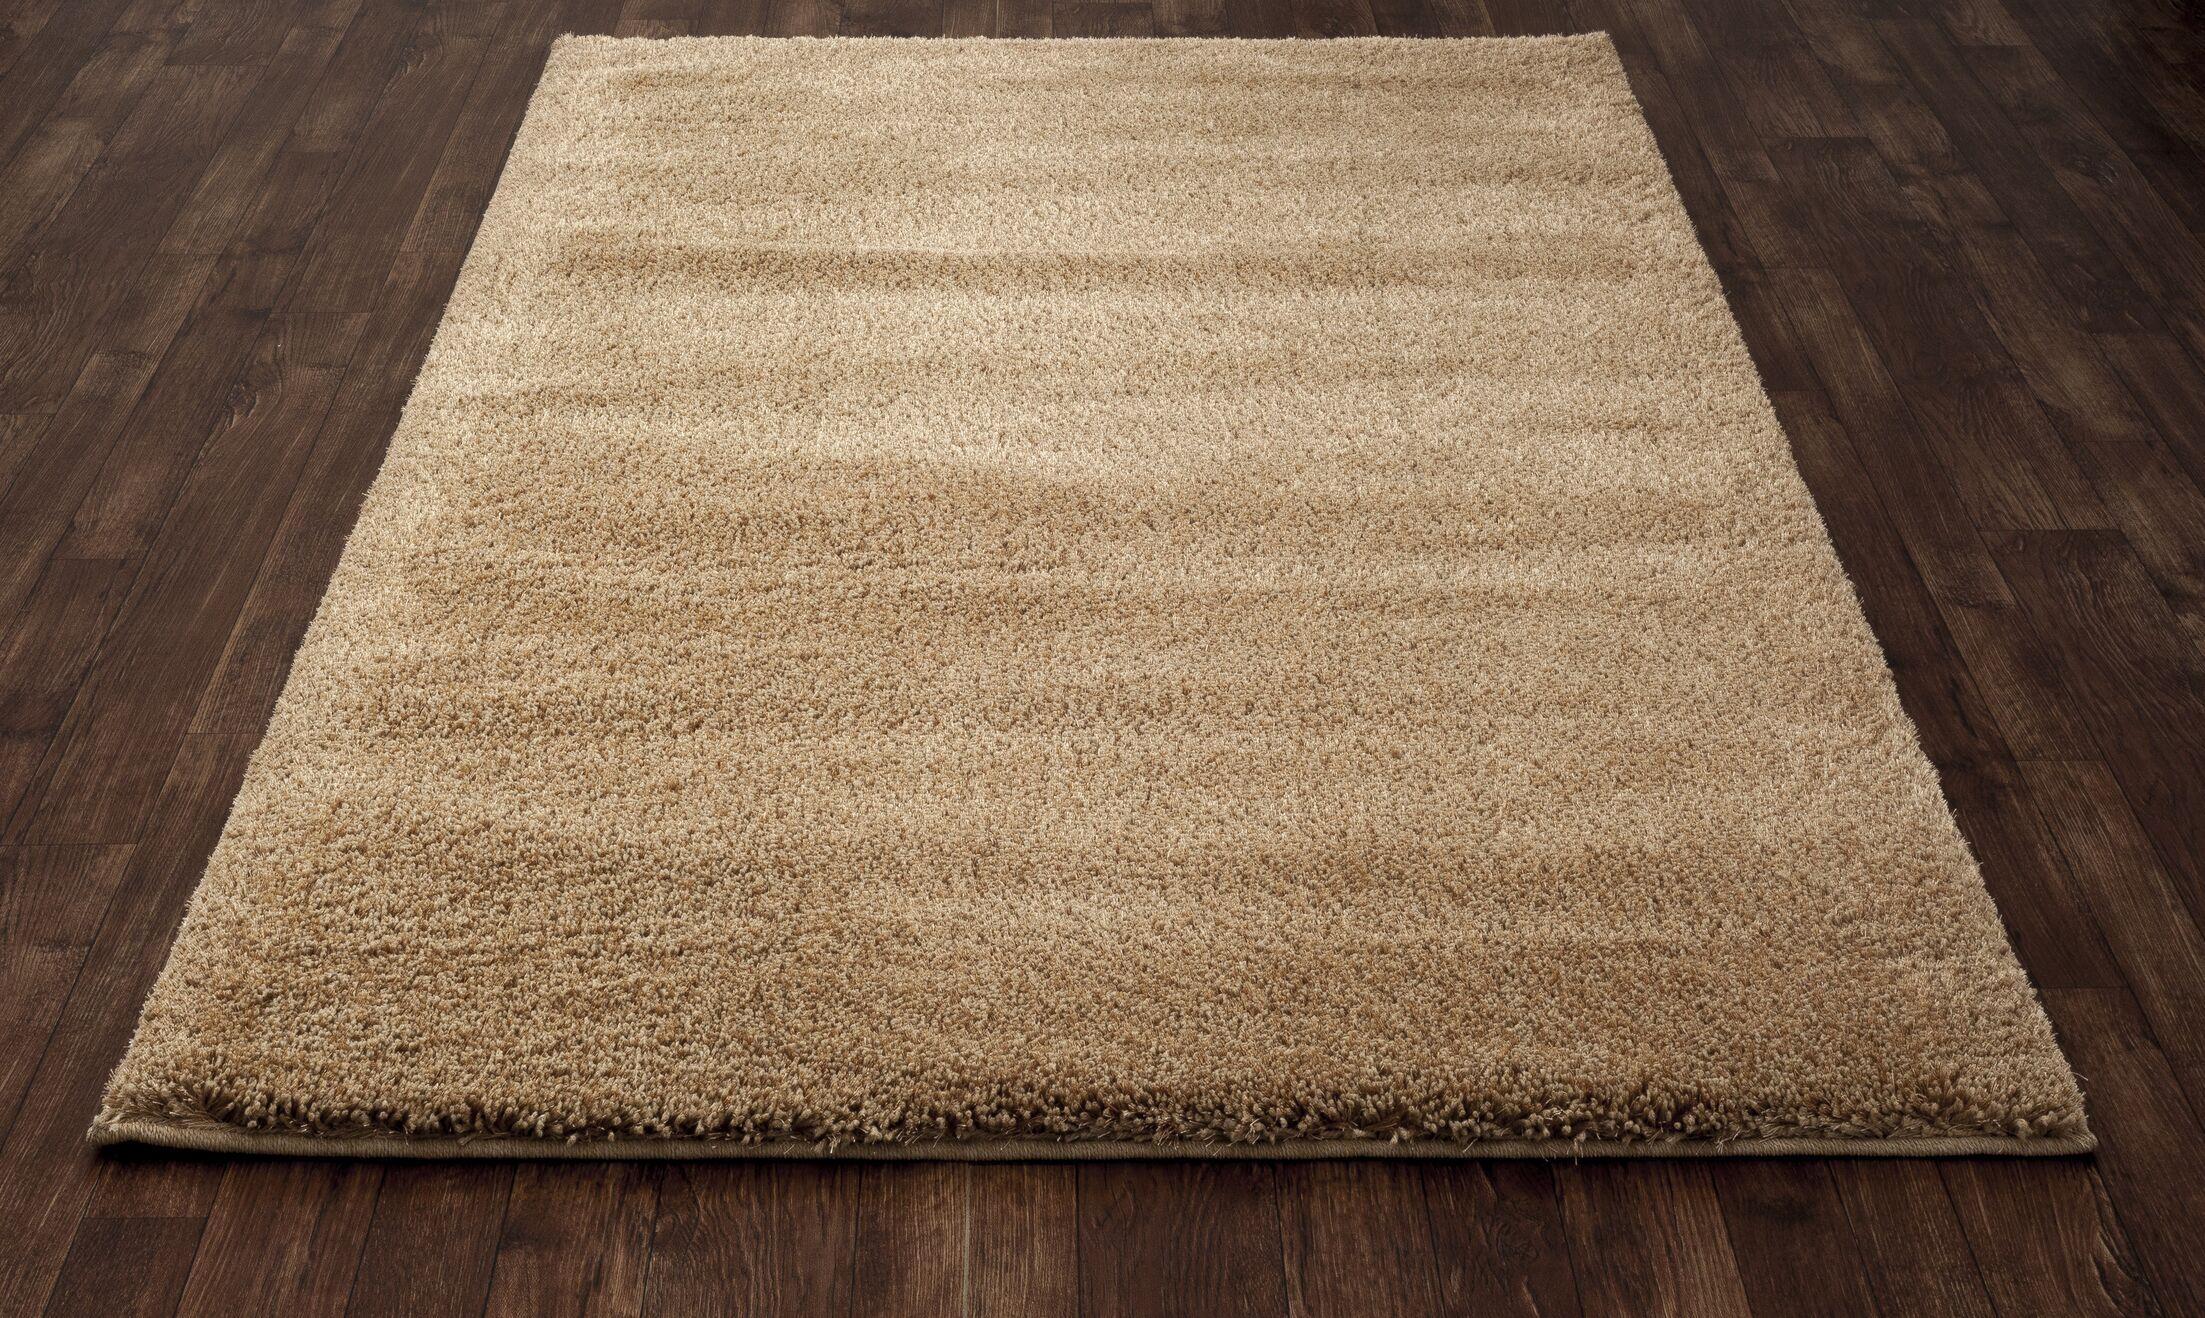 Hickey Plush Pile Shag Desert Sand Area Rug Rug Size: Rectangle 5'3